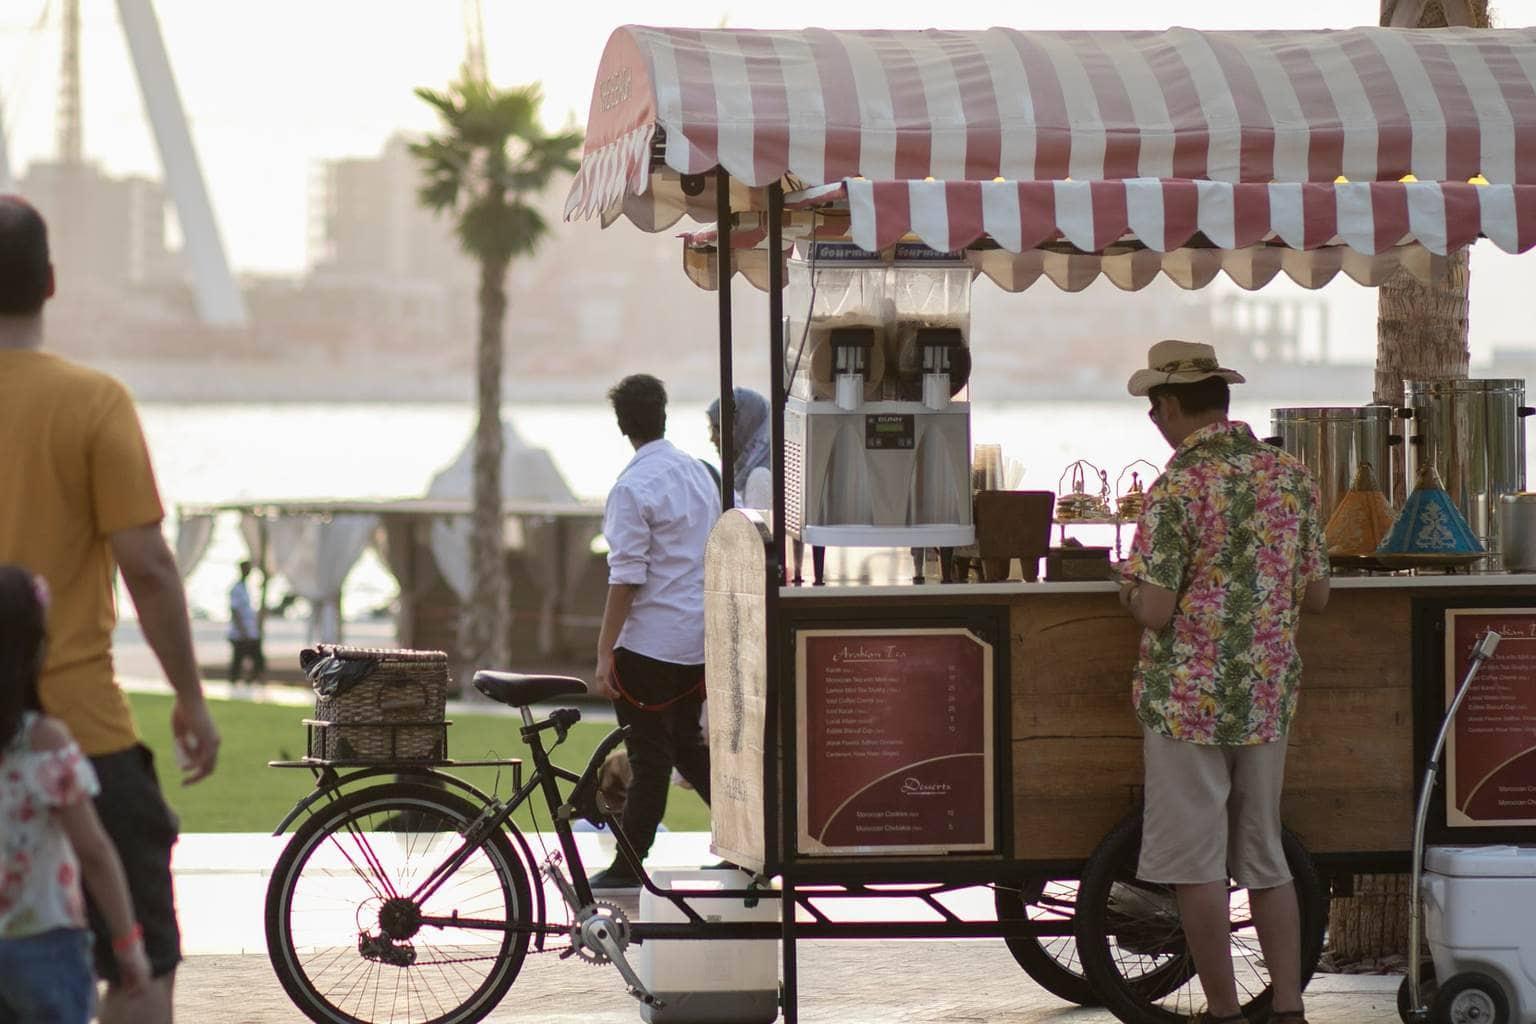 Vendor at The Walk at Jumeirah Beach